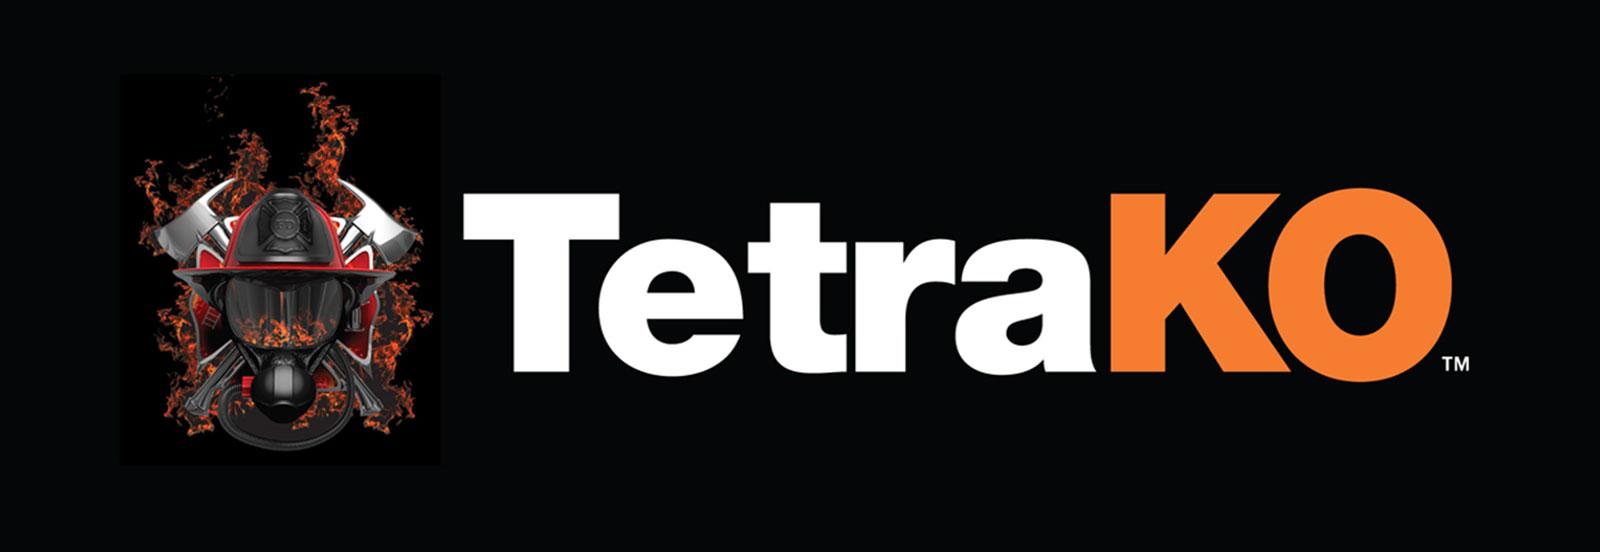 TetraKO_HP_1600x552_09